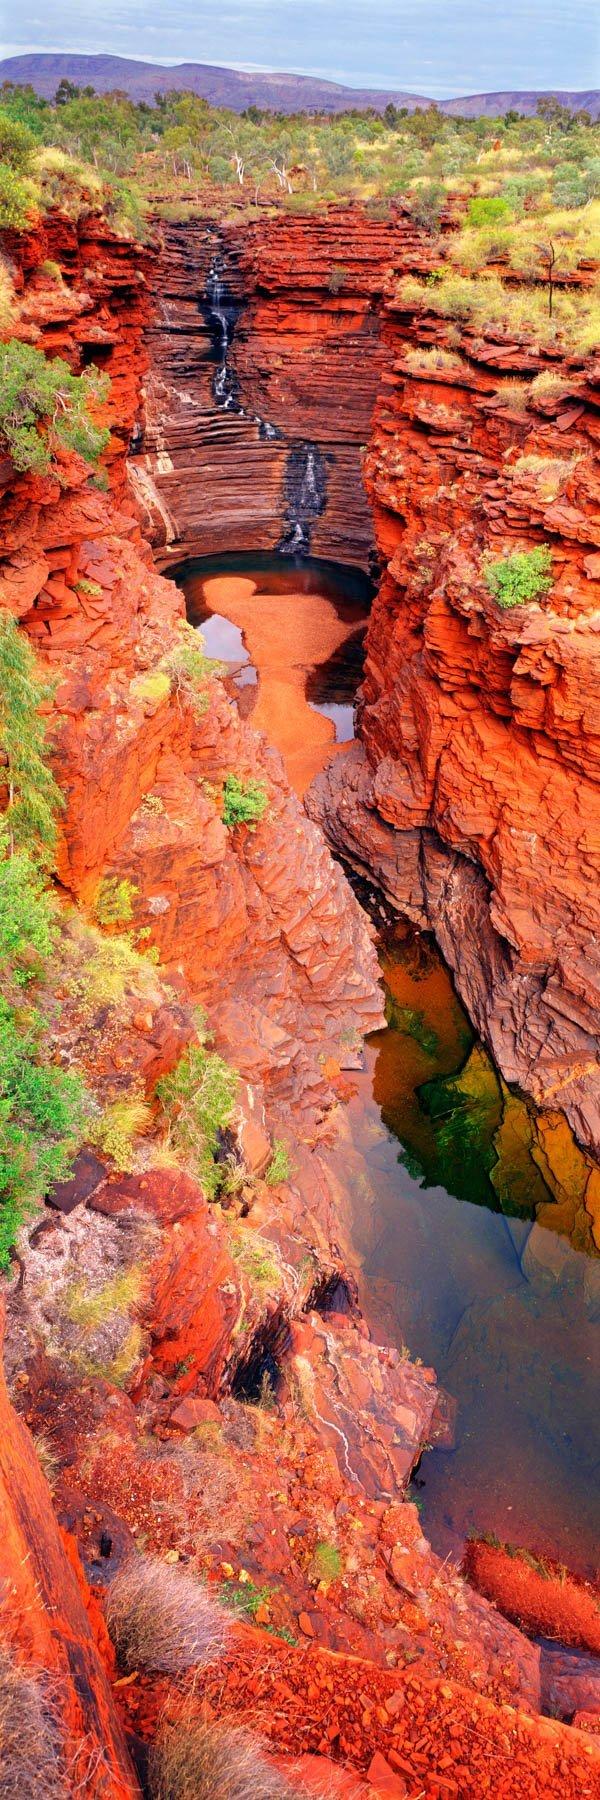 Vertical view of Joffre Falls, Karijini National Park, WA, Australia.